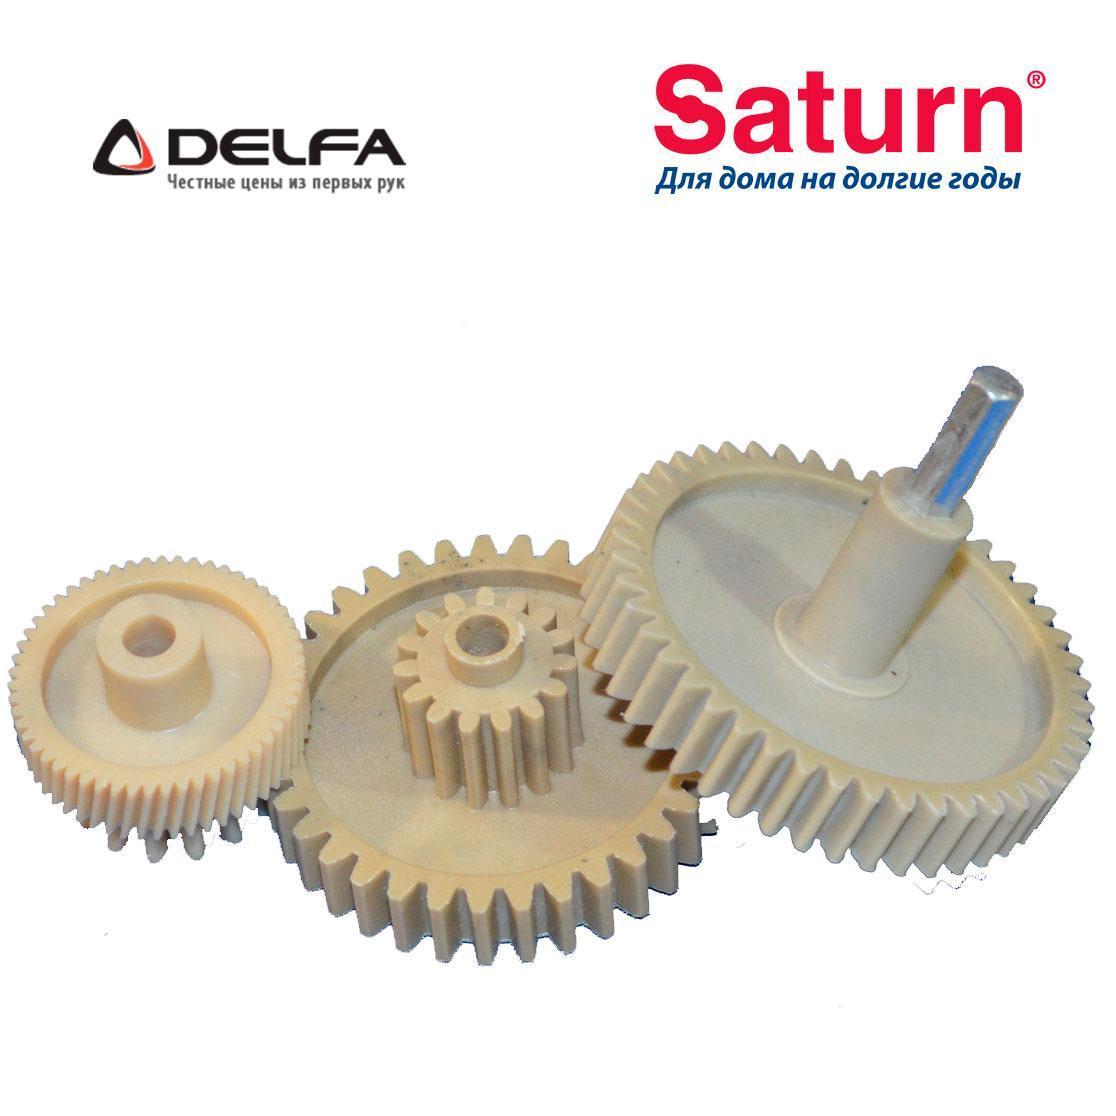 Набор шестерней для мясорубок Delfa, Saturn, Vitek